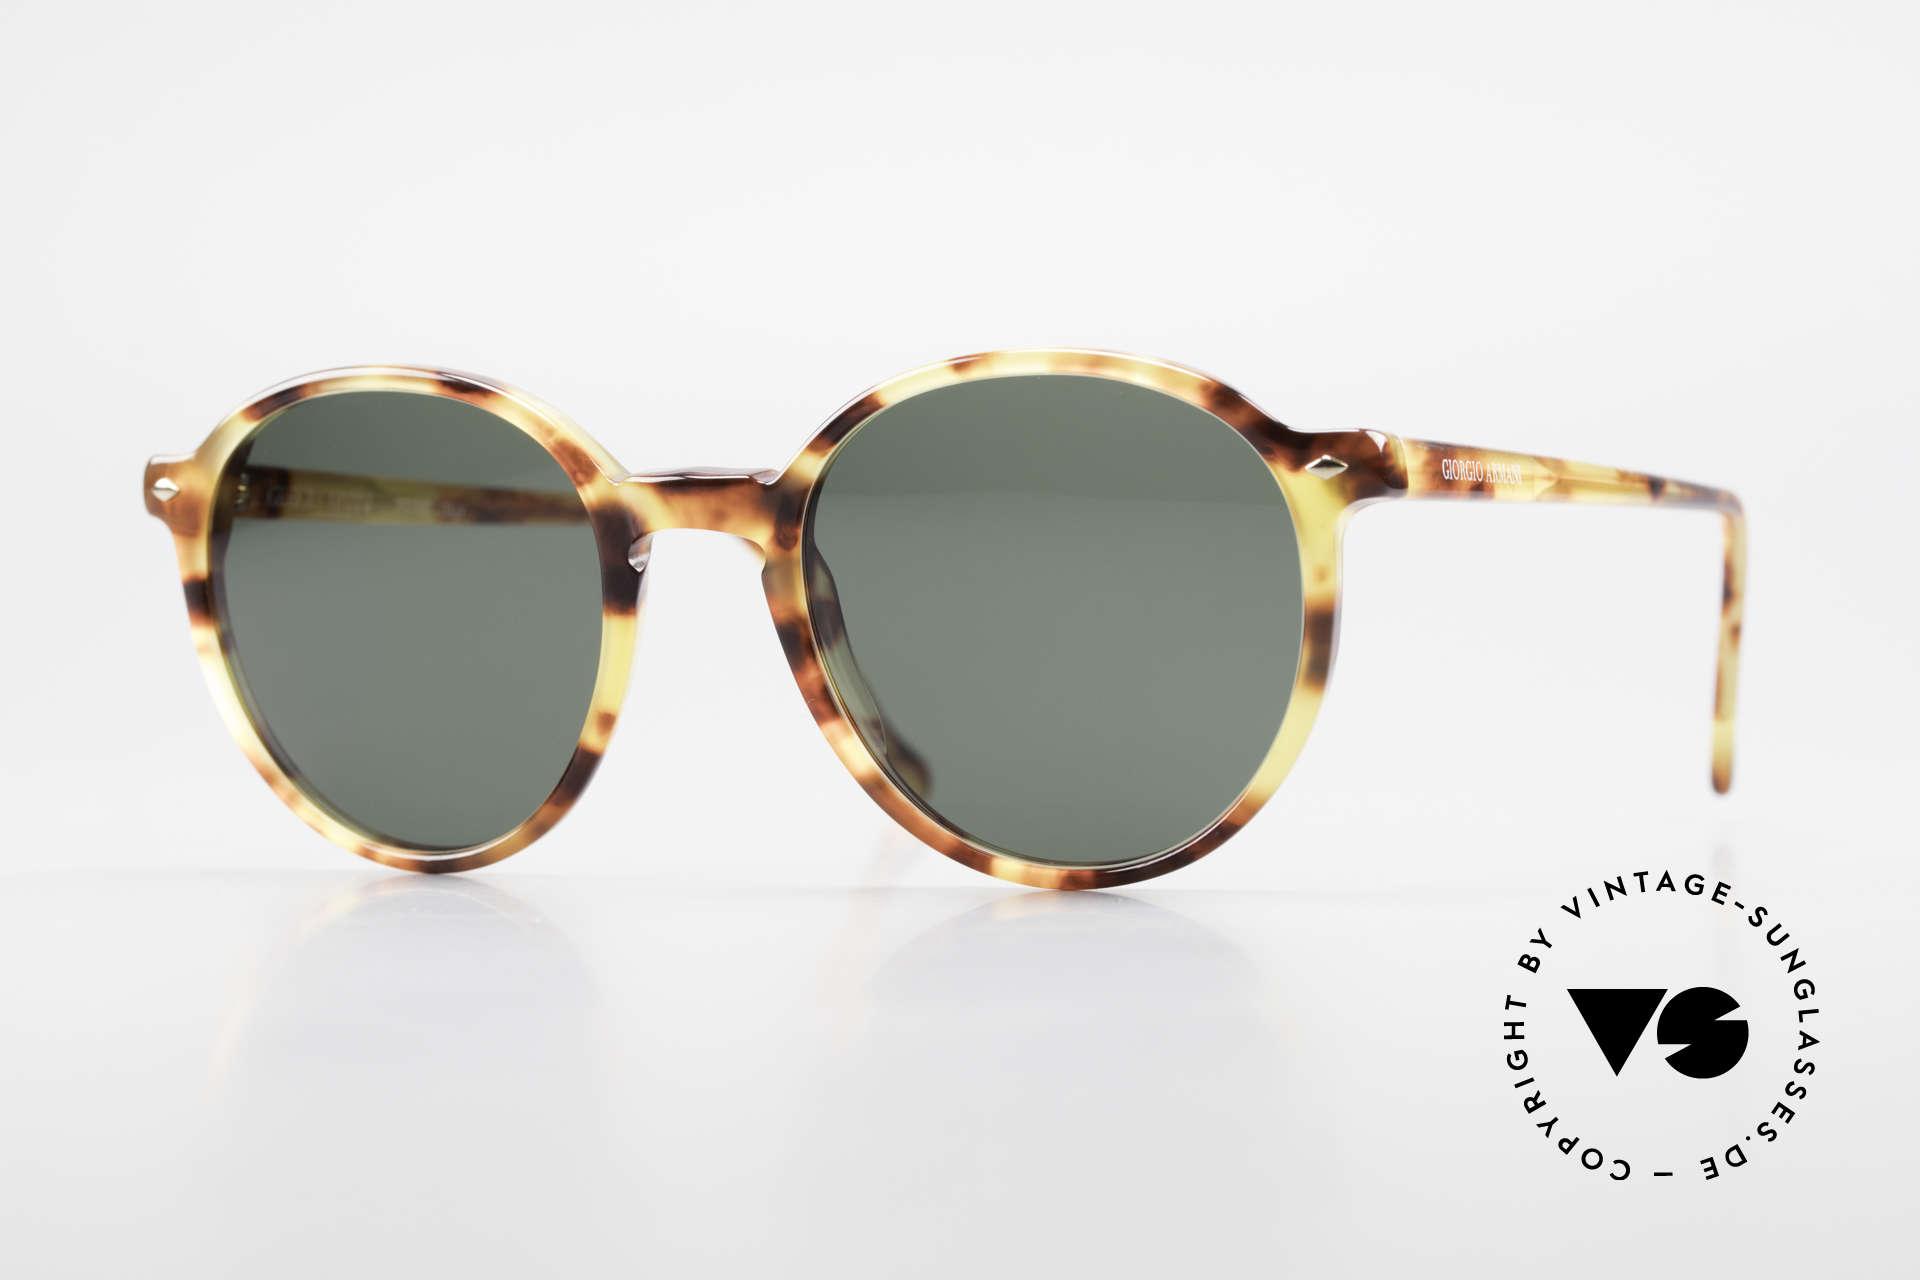 Giorgio Armani 325 Old Panto 90's Sunglasses, timeless vintage Giorgio Armani designer sunglasses, Made for Men and Women